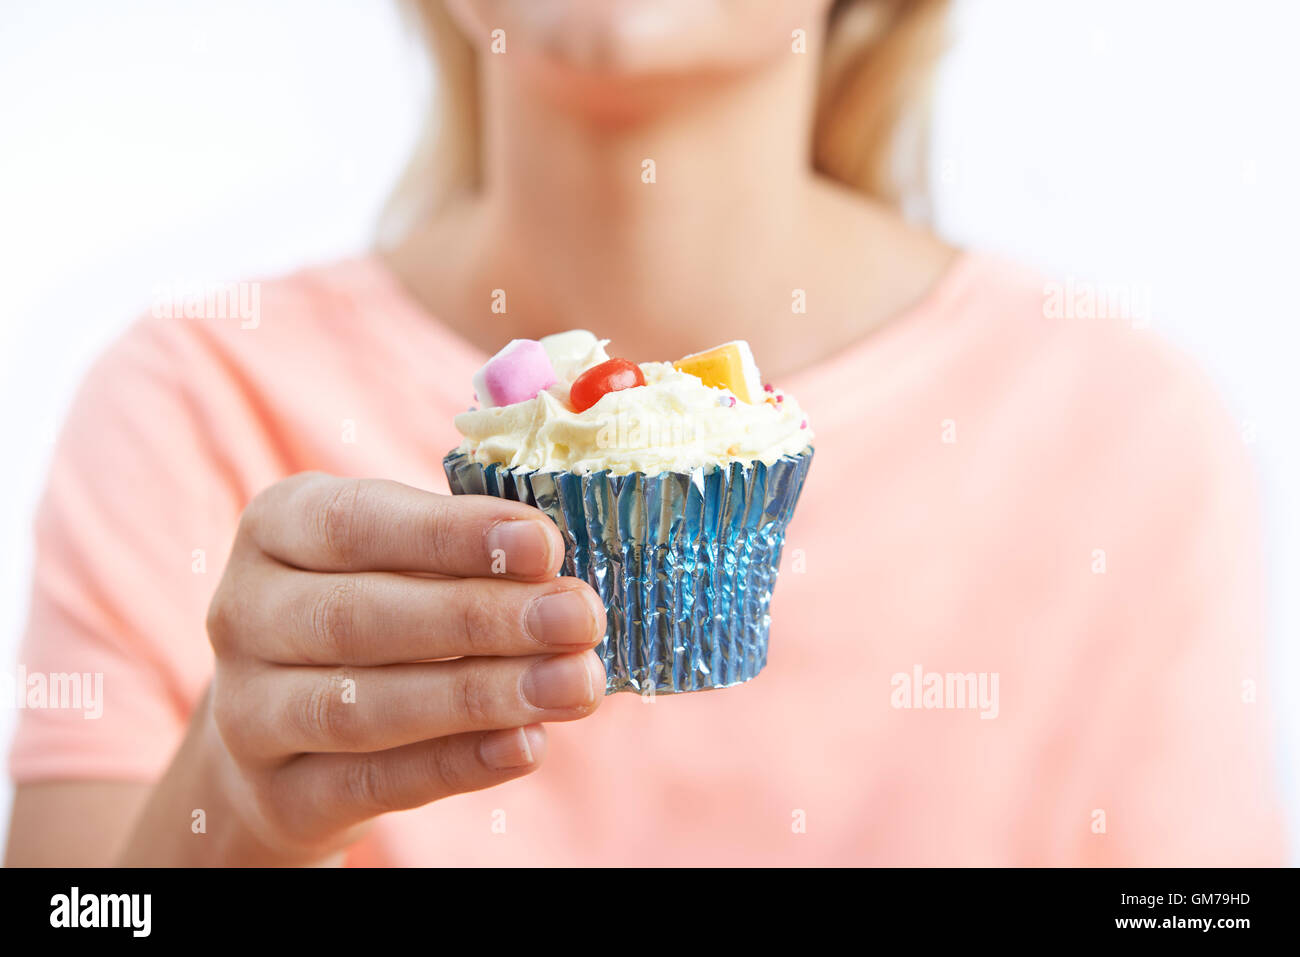 Close Up of Woman Holding Cupcake malsain Photo Stock